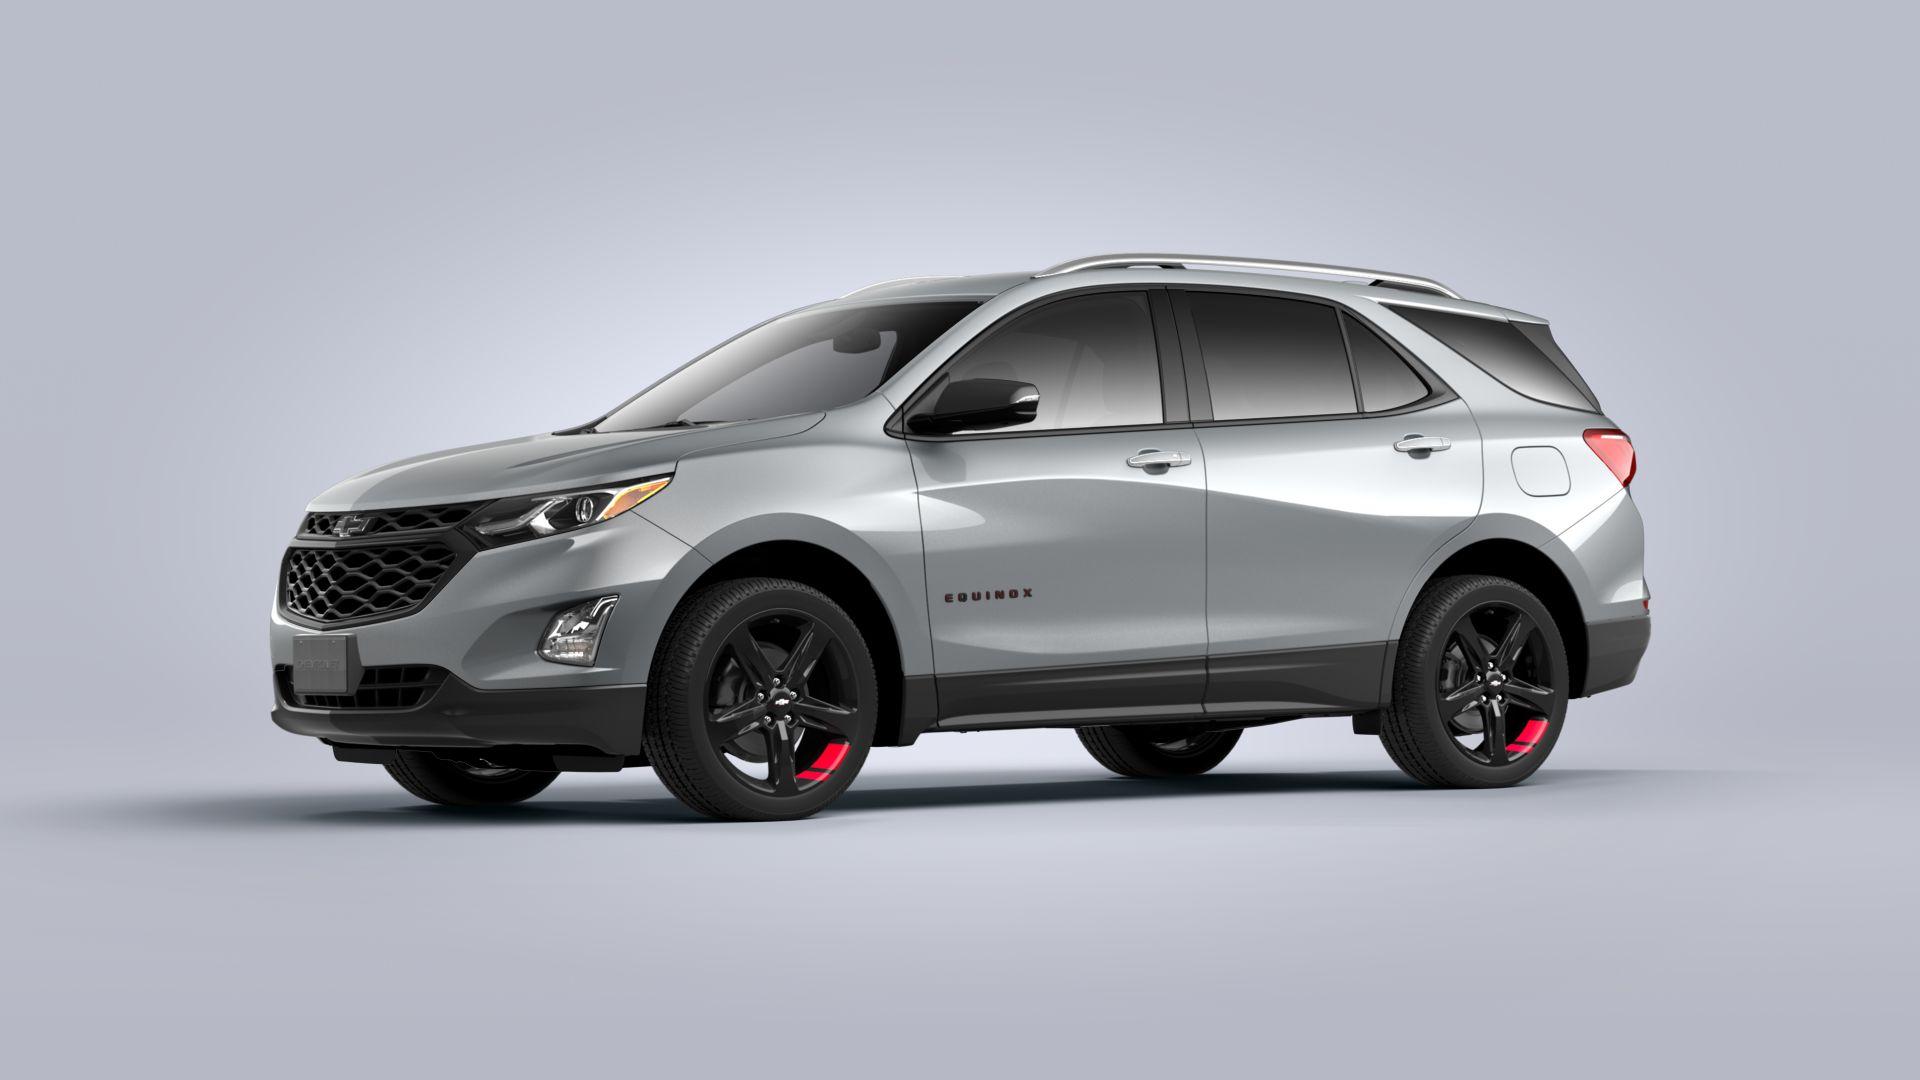 2020 Chevrolet Equinox Premier Crossover